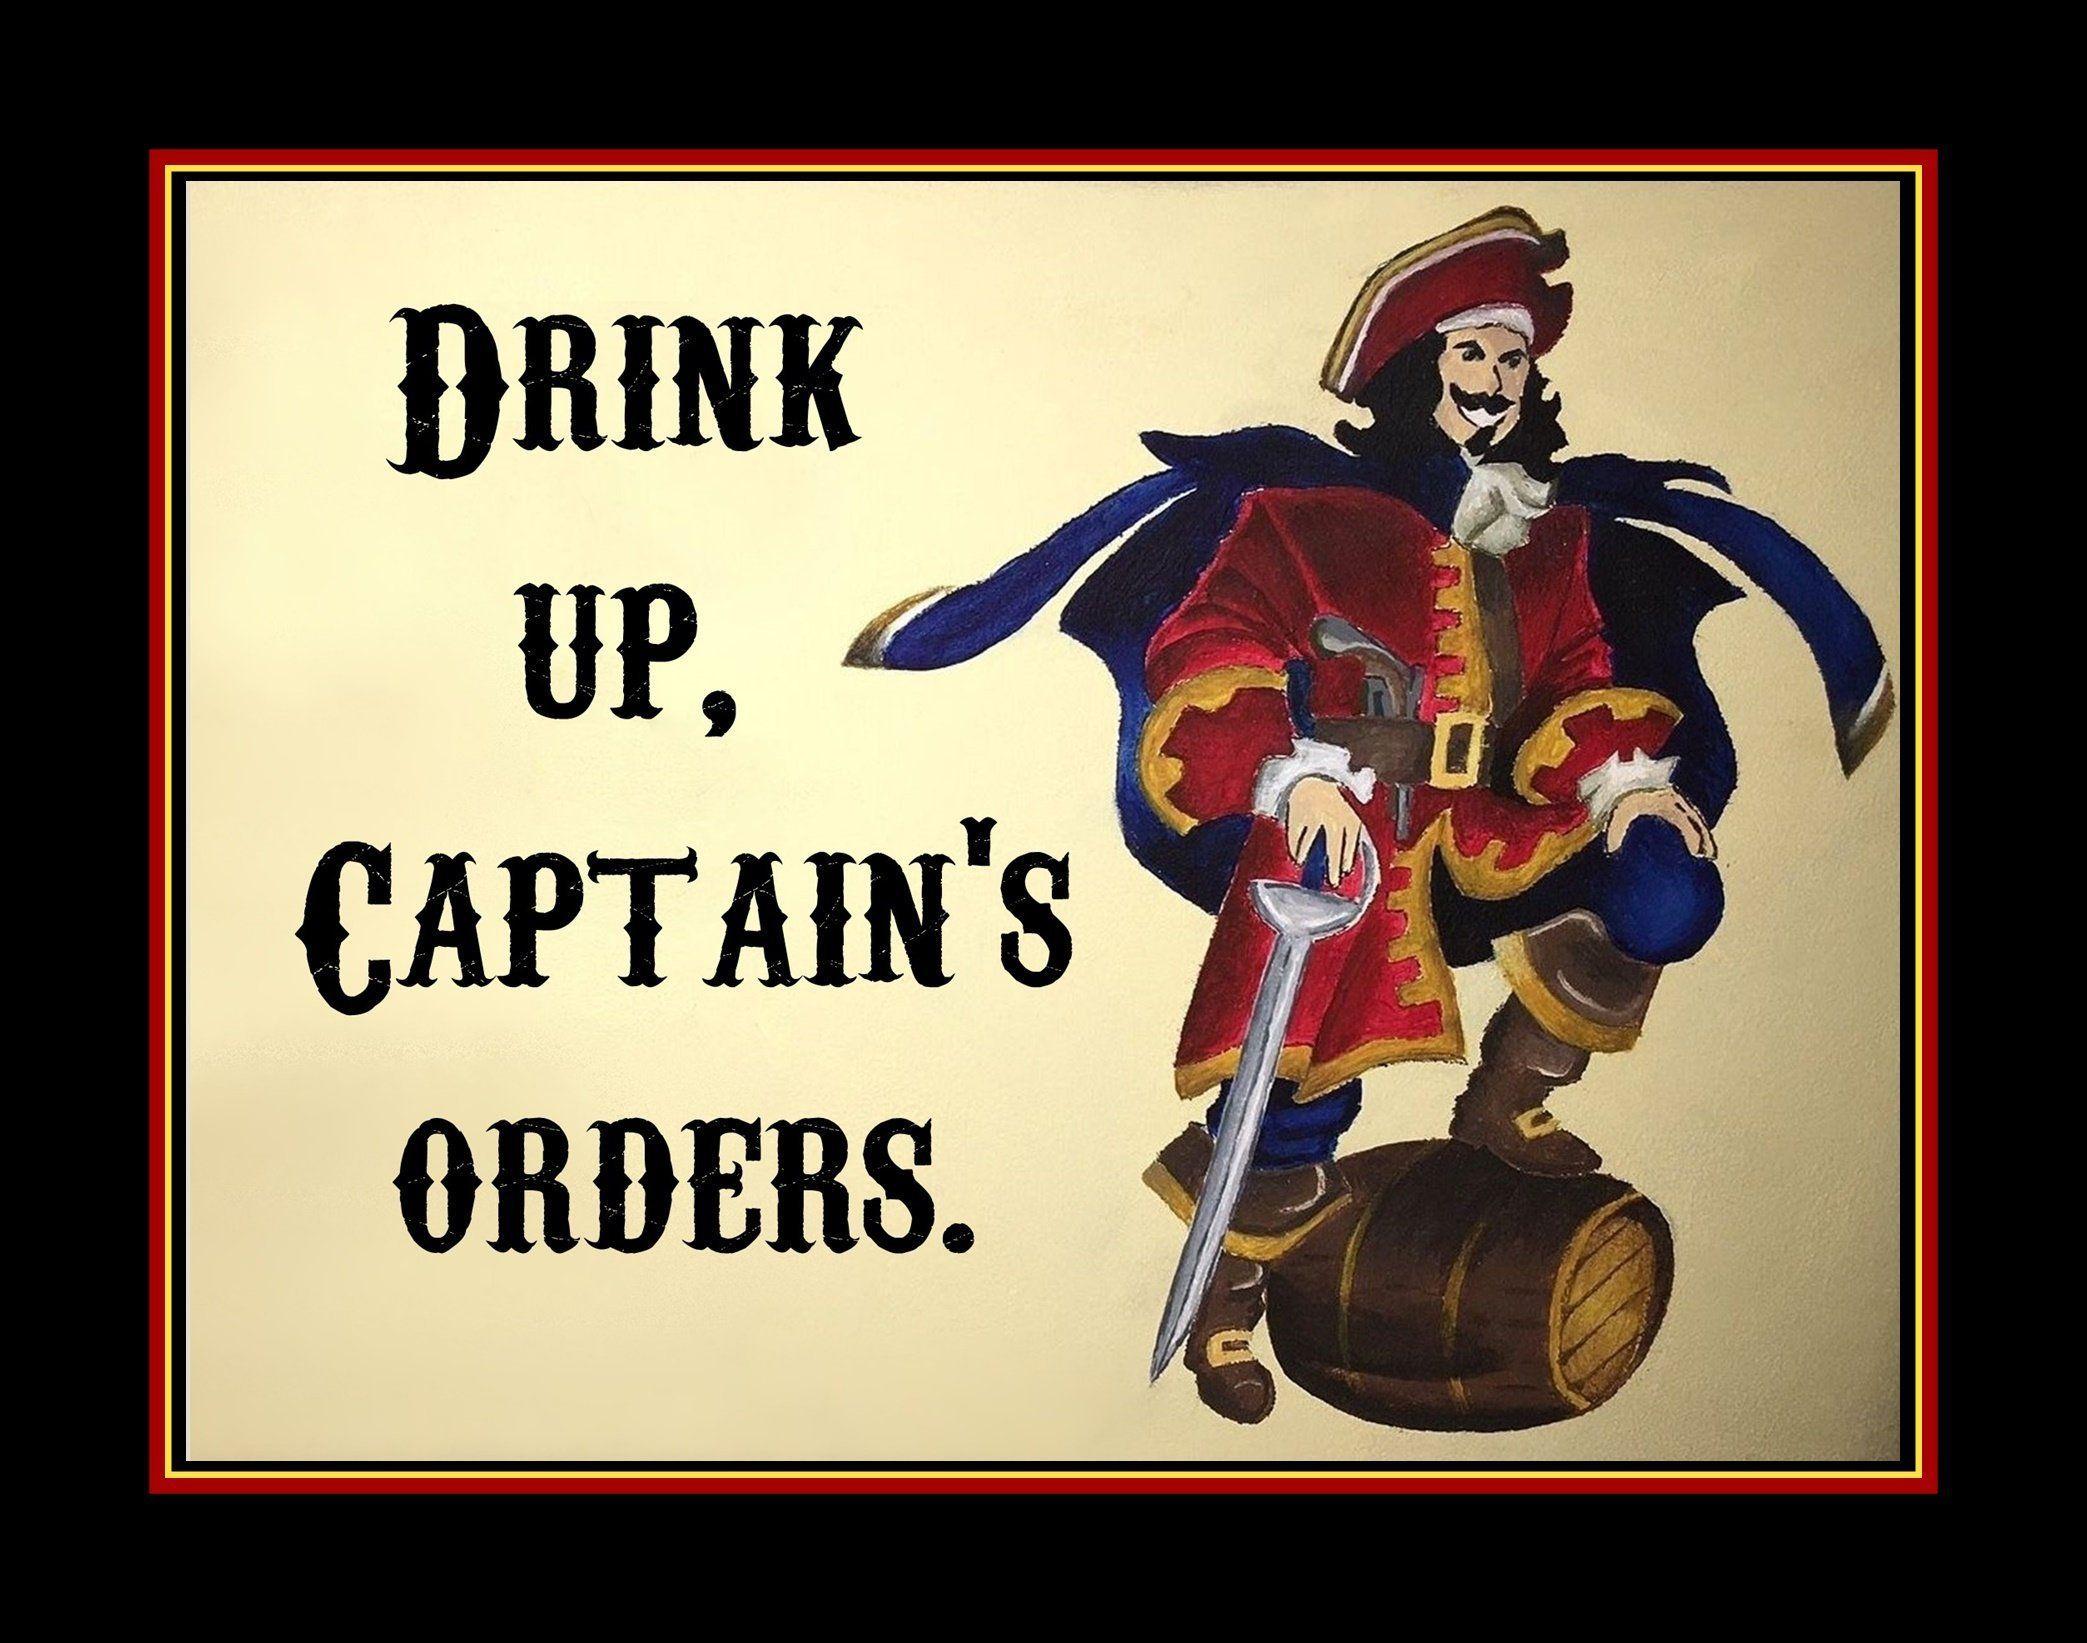 Pin By Arleyart Sports Motivation On Kraft Captain Morgan Captain Morgan Party Captain Morgan Gift